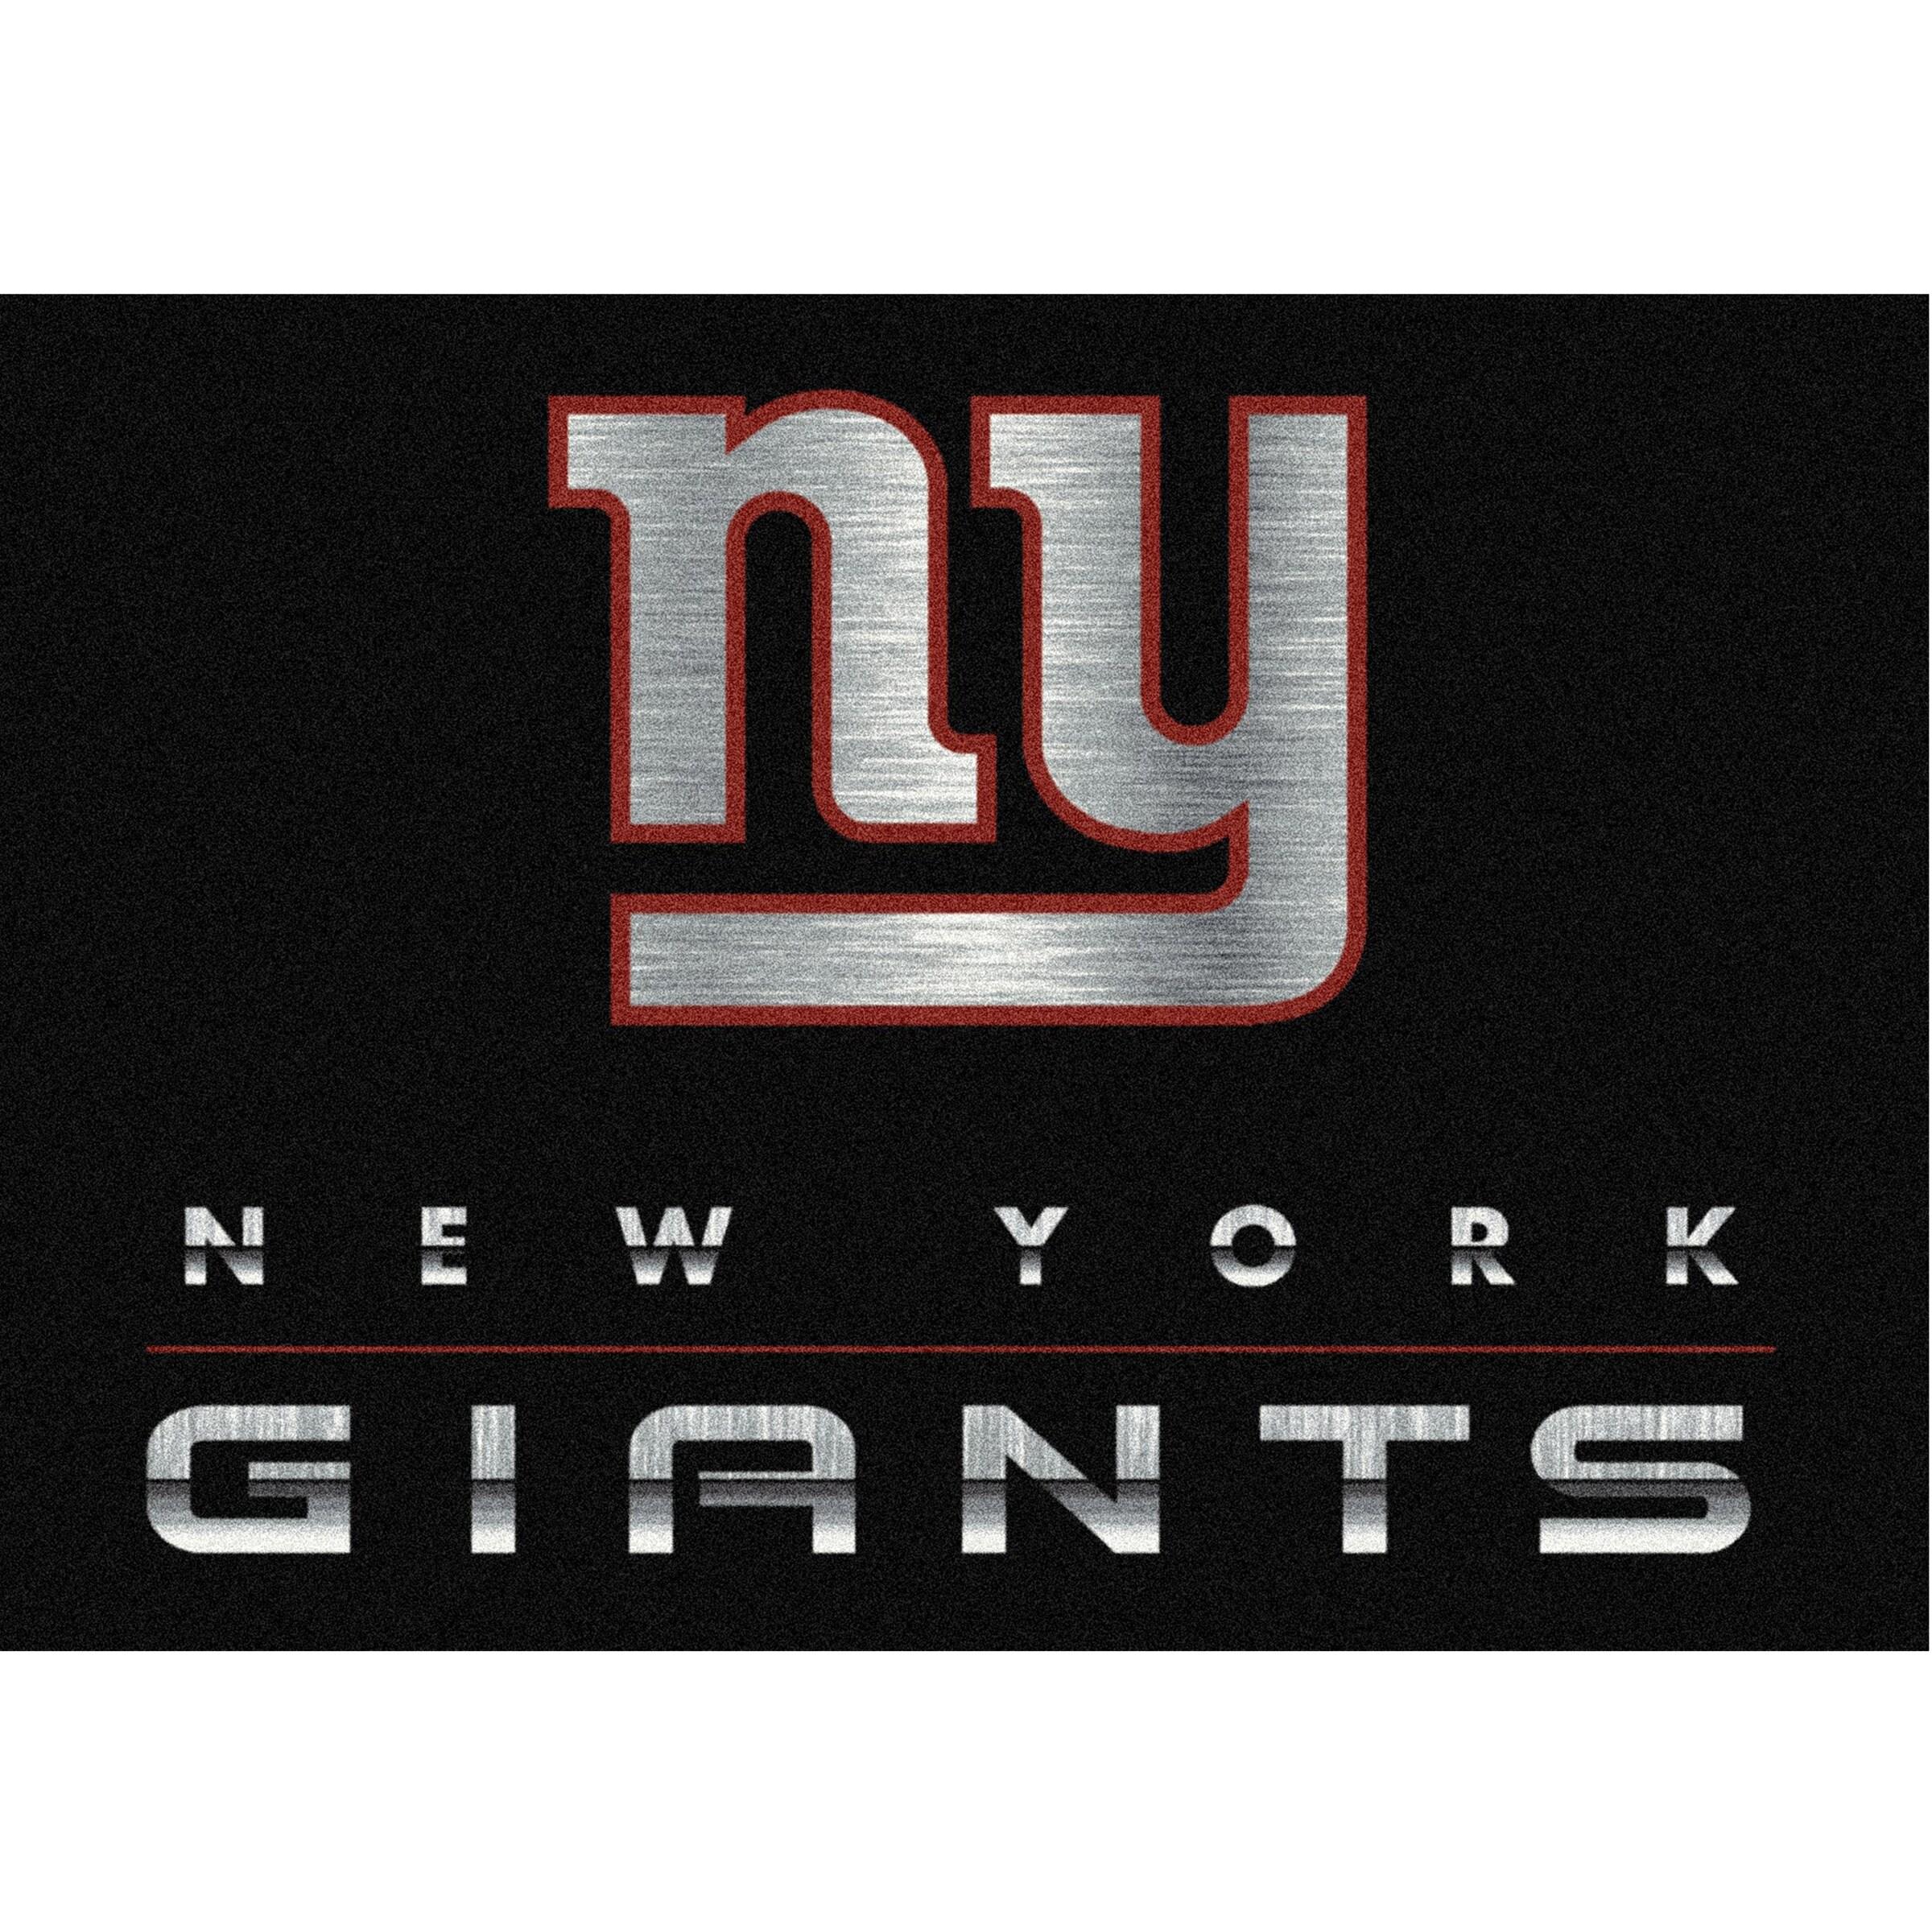 New York Giants Imperial 6' x 8' Chrome Rug